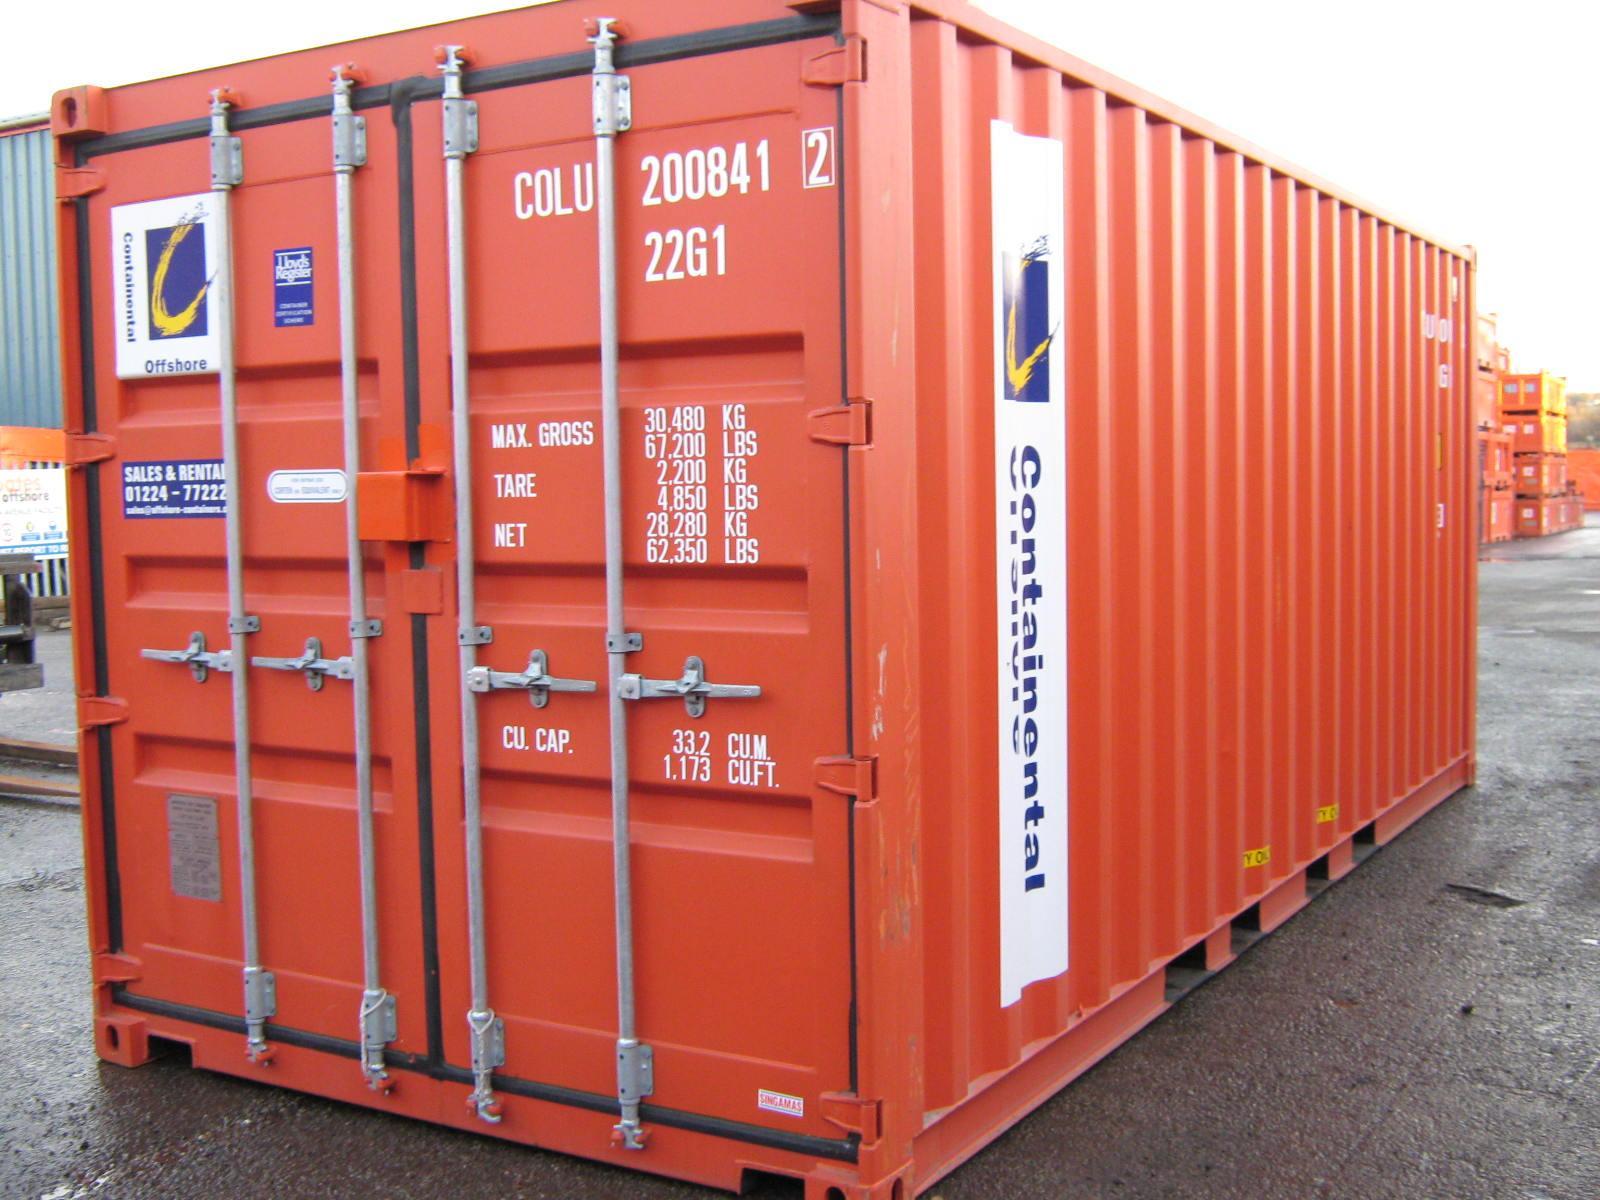 Ký hiệu Container